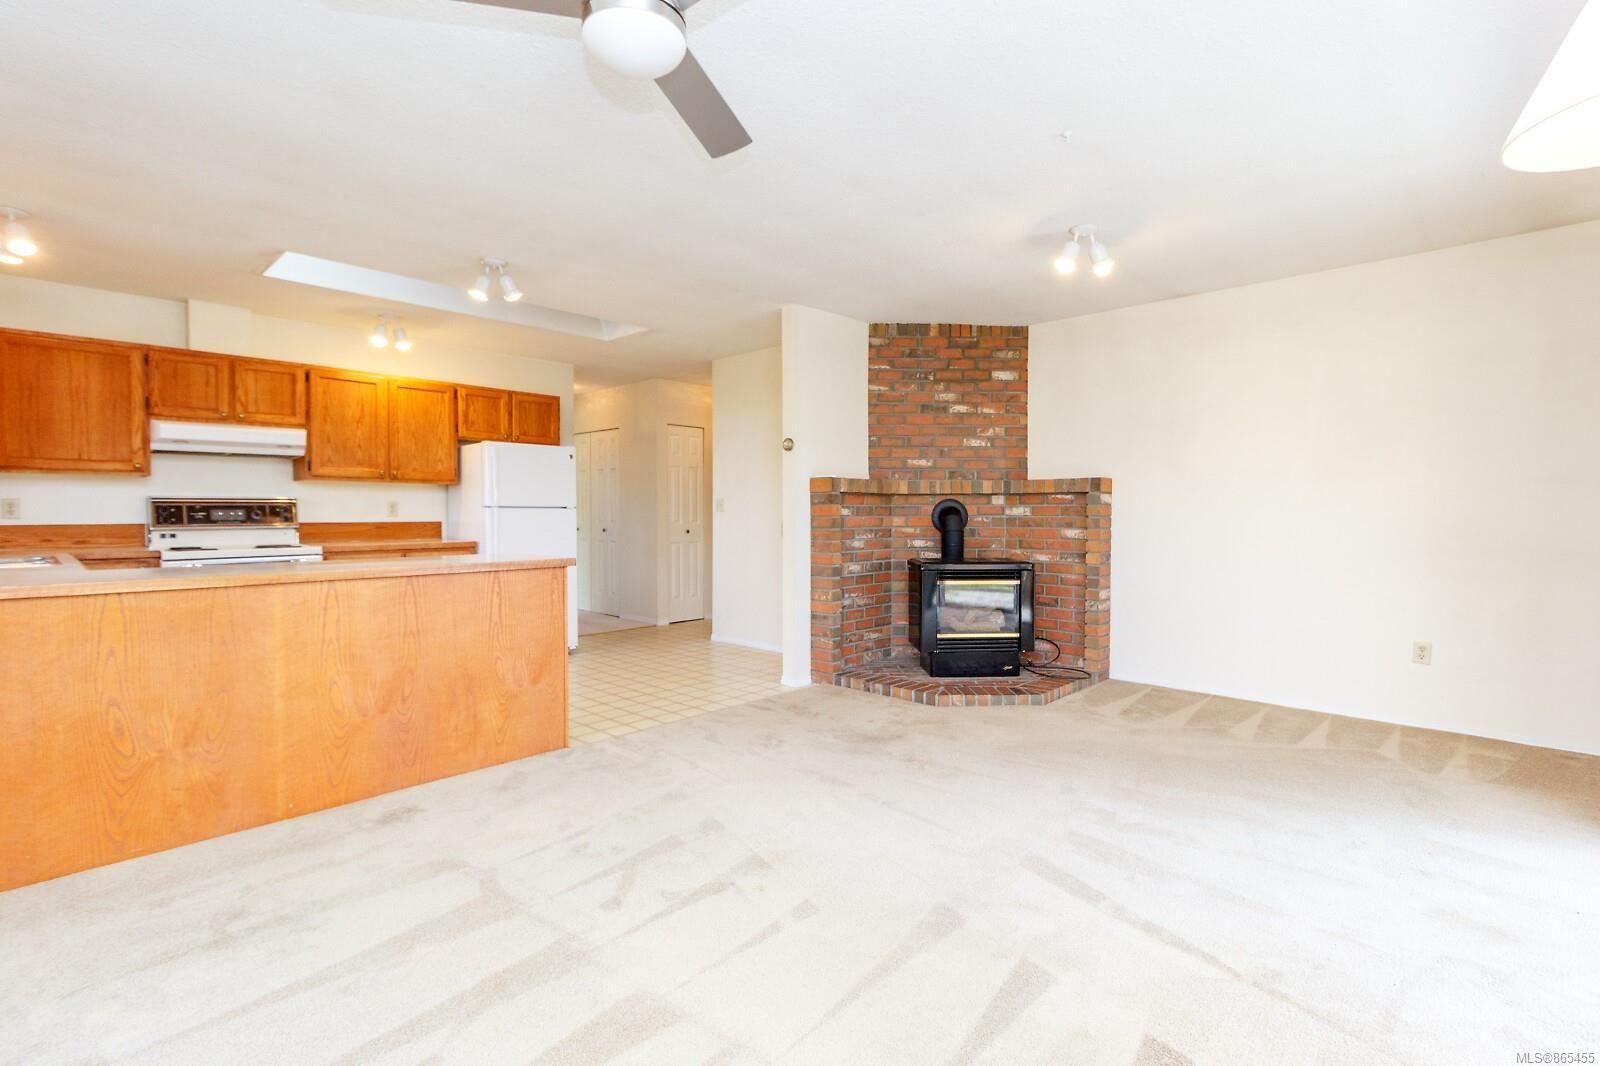 Photo 11: Photos: 399 Beech Ave in : Du East Duncan House for sale (Duncan)  : MLS®# 865455